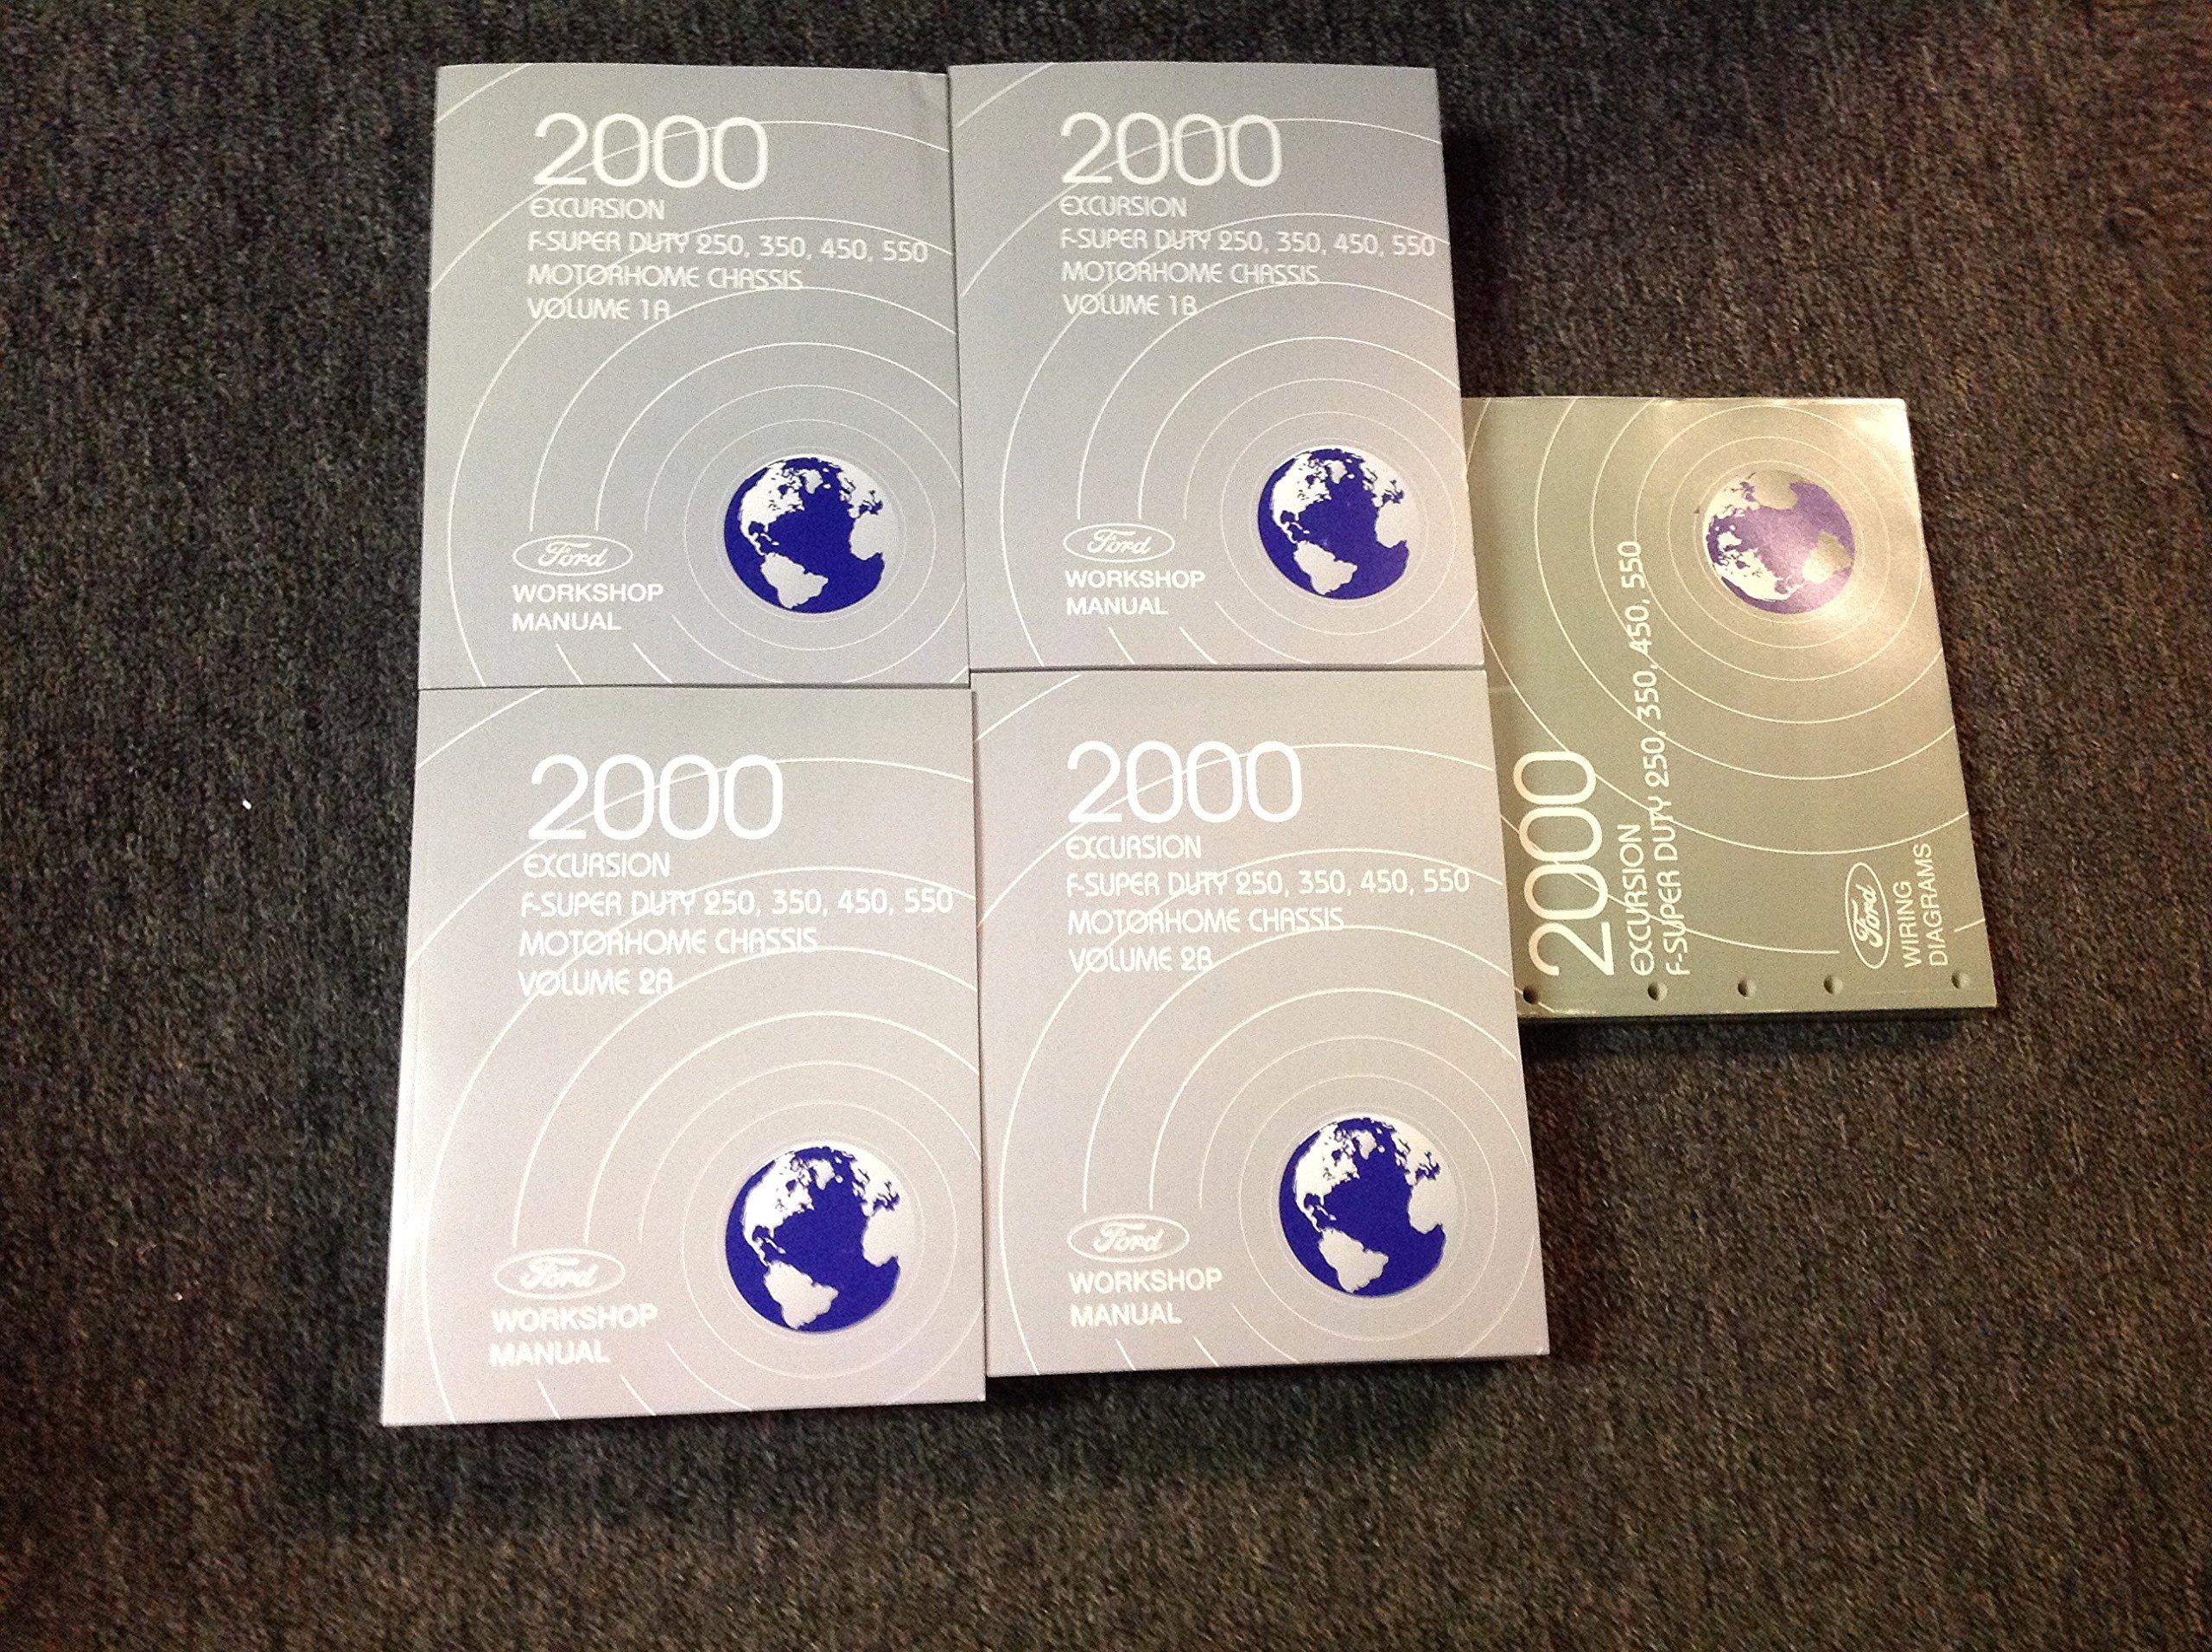 2000 ford truck excursion f250 350 450 550 service shop repair manual set  new w ewd paperback – 2000